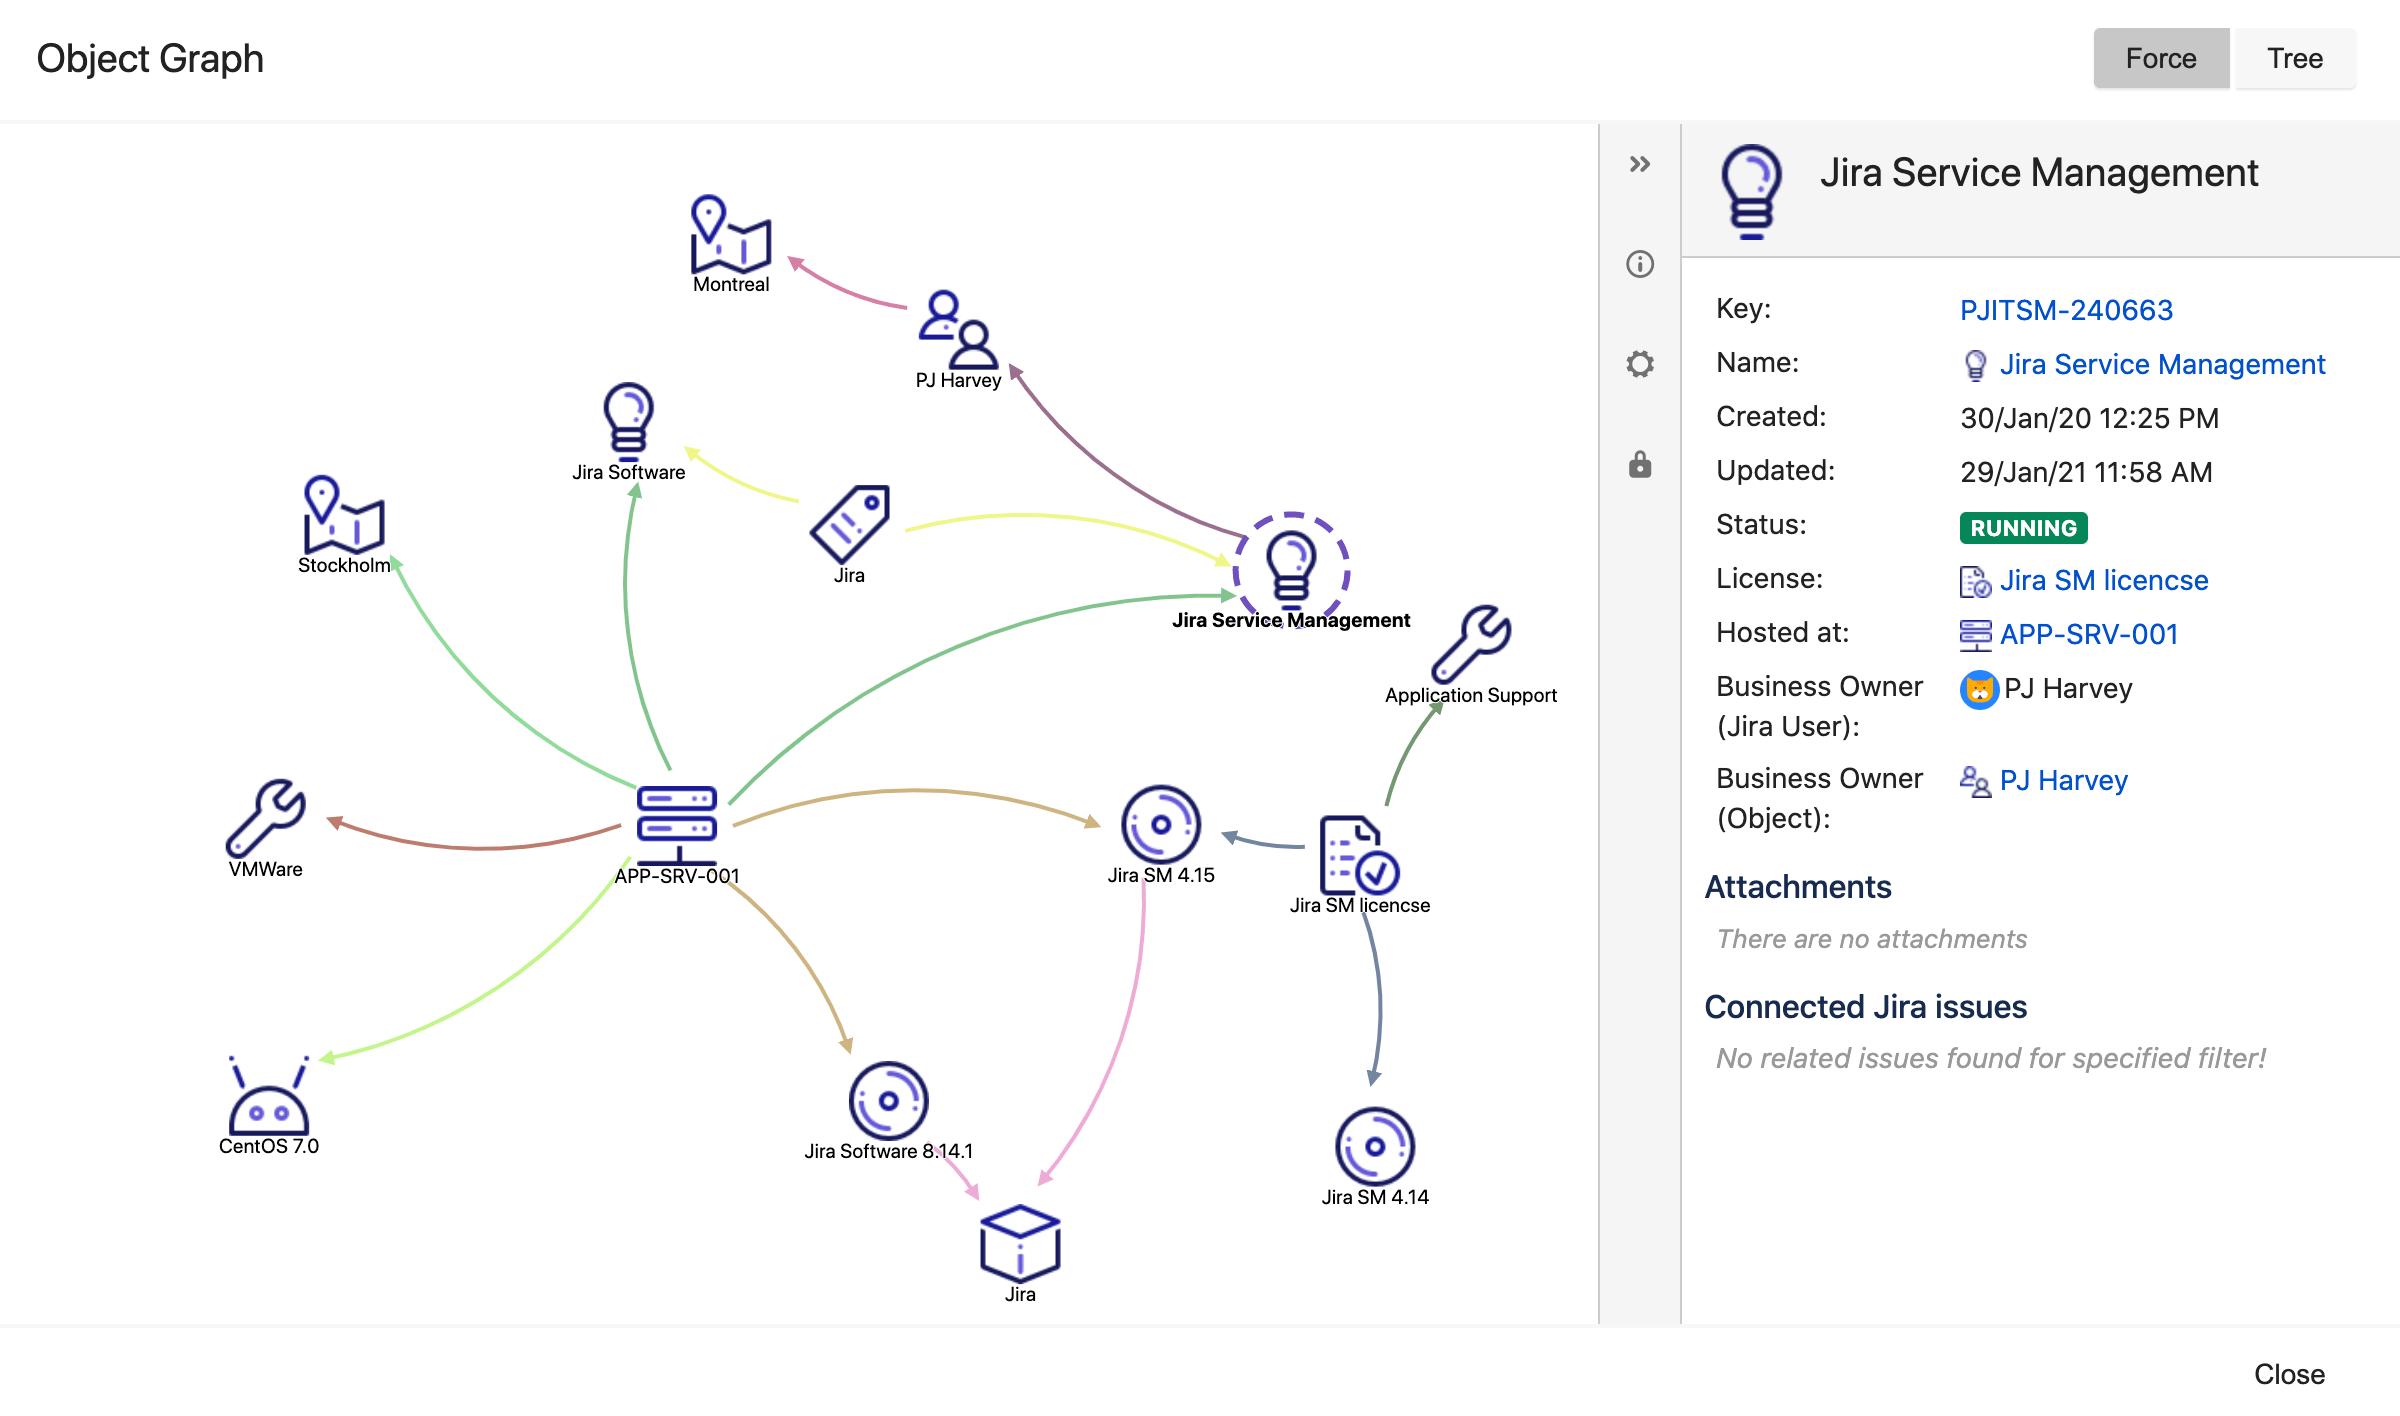 'Jira Service Management' 개체에 대한 Insight 그래픽 조회자 창입니다. 설치된 호스트, OS, 필요한 여러 Jira 버전 및 라이선스 등의 종속성을 표시합니다.